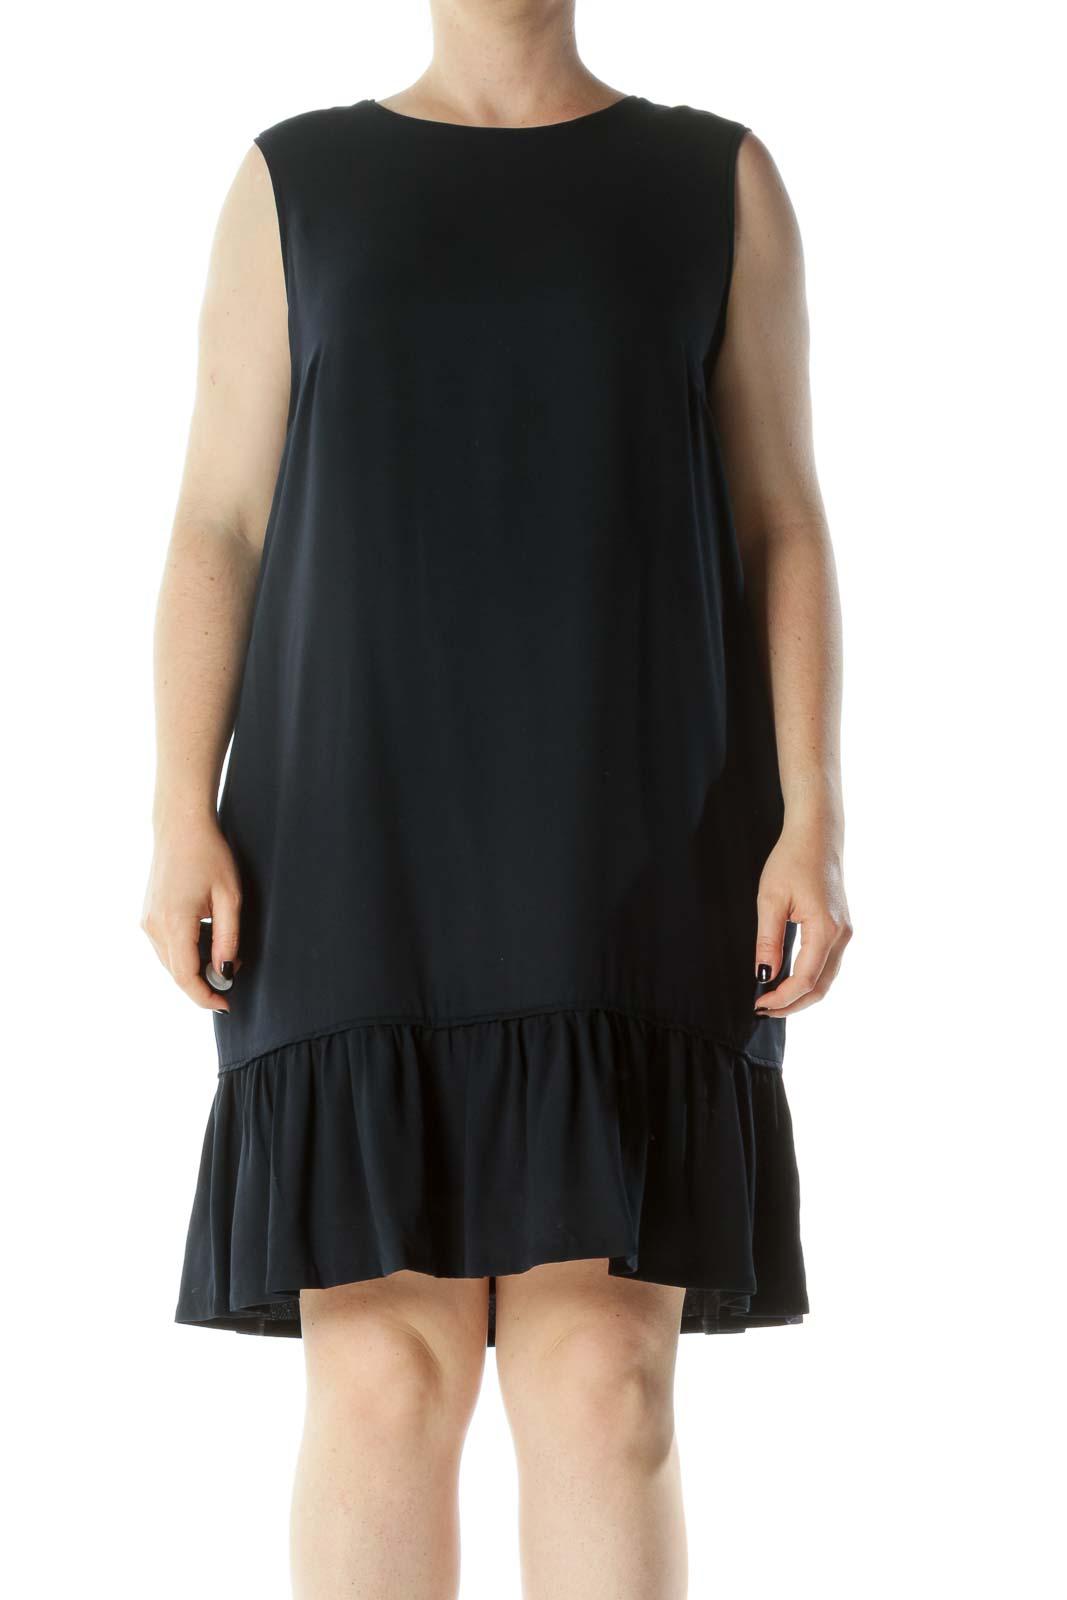 Navy Blue Round Neck Sleeveless Pocketed Flared Detail Dress